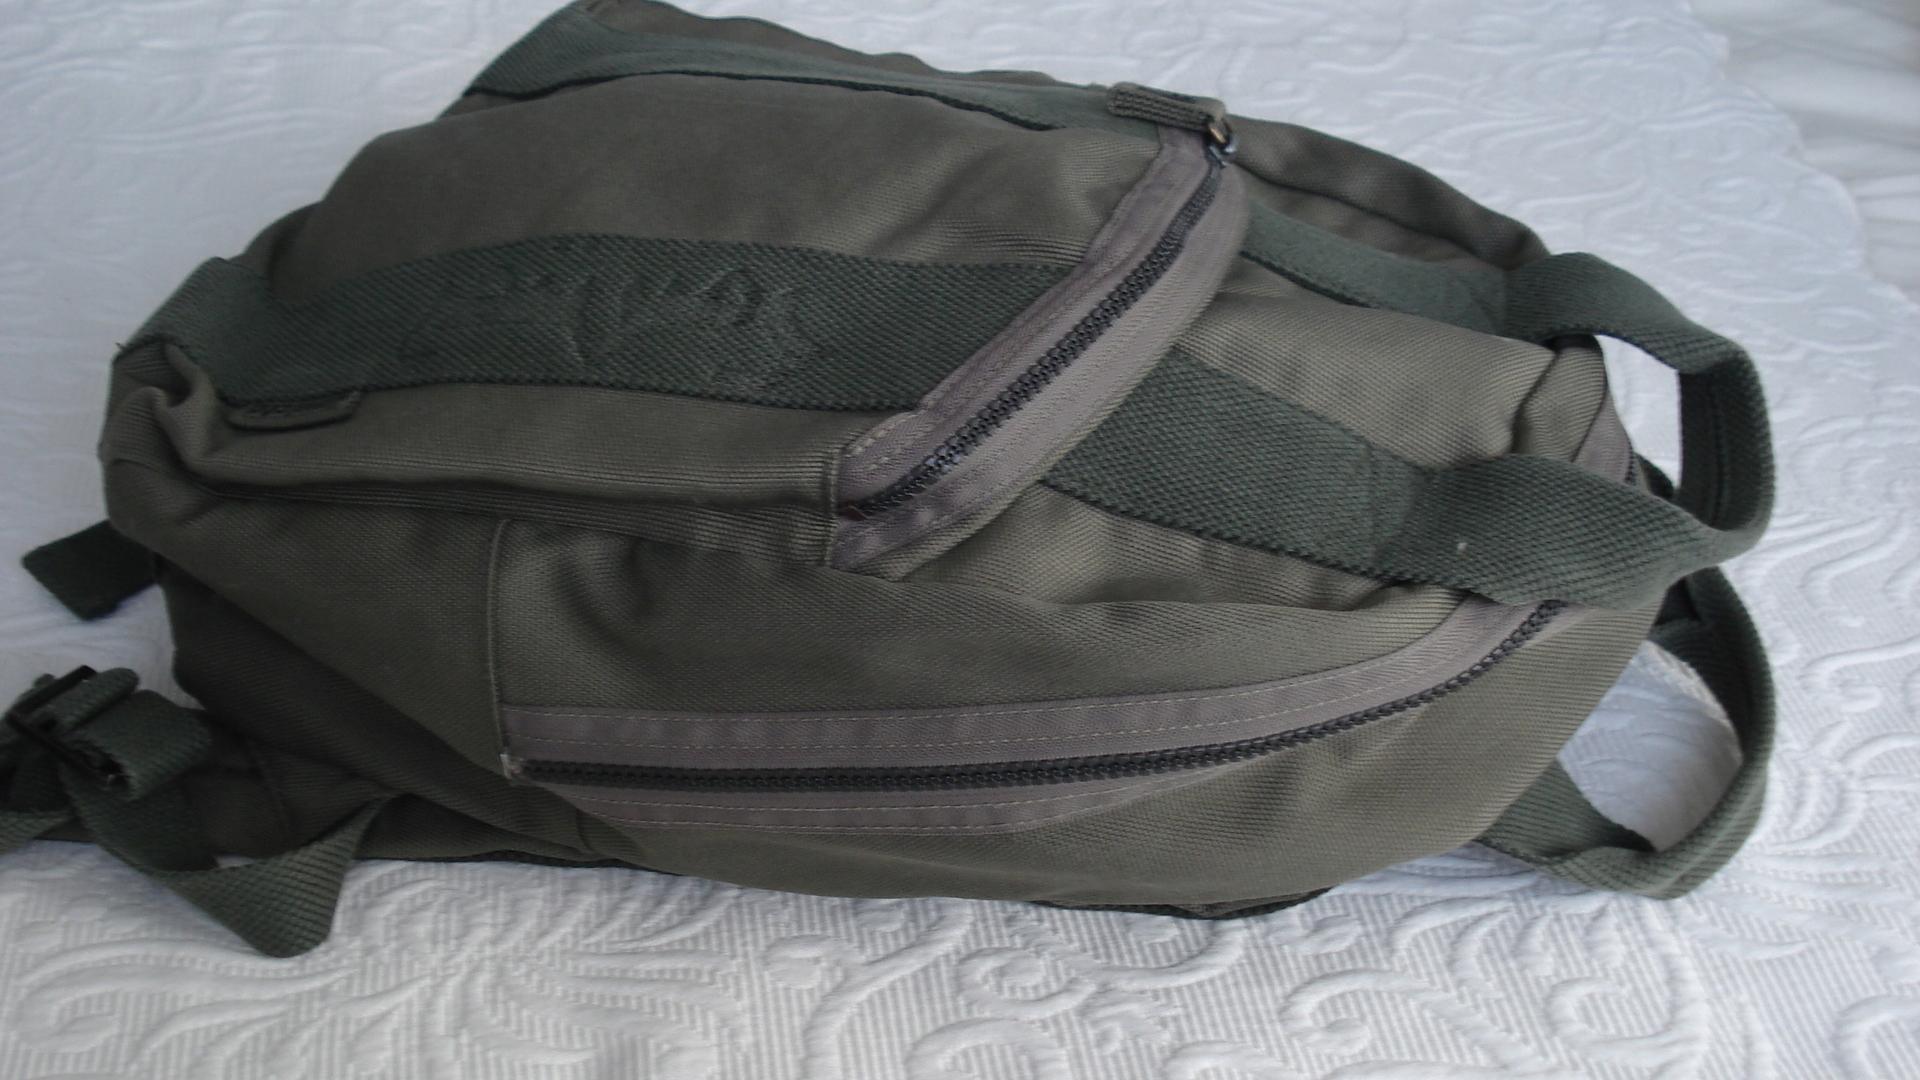 Plecak Invicta mały